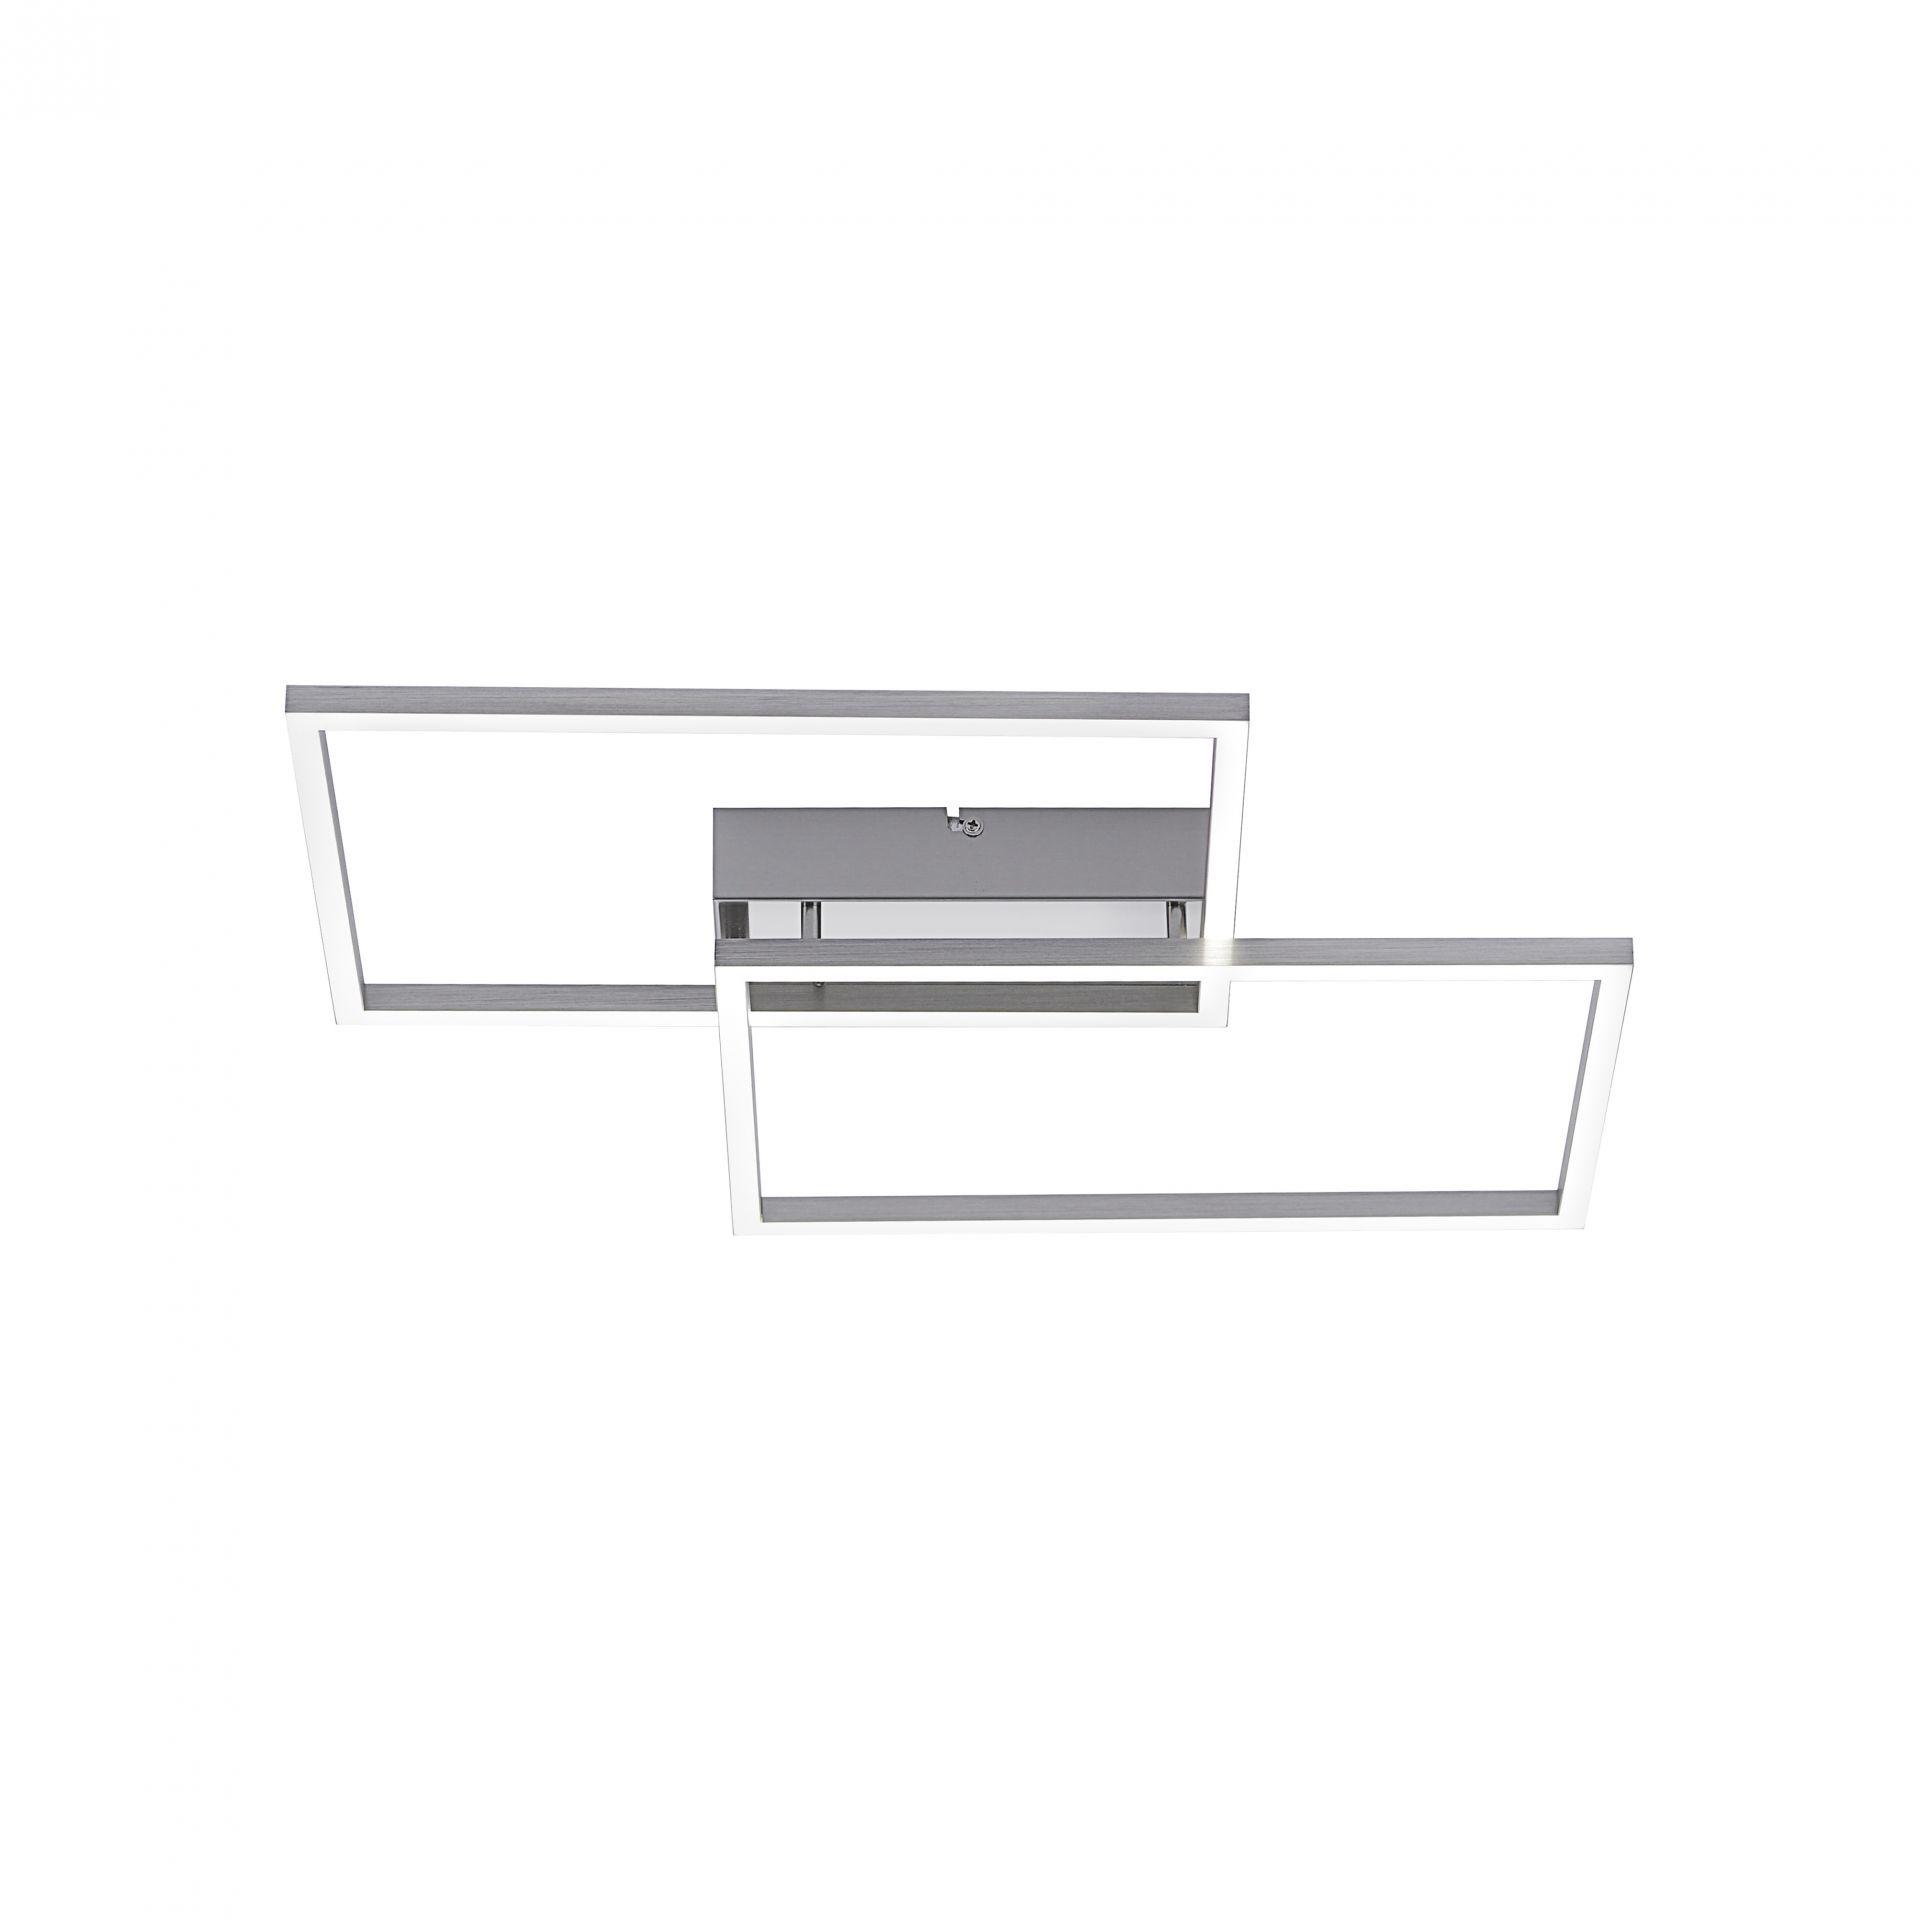 Plafondlamp Iven RVS Led Incl. Afstandbediening |  | 7061286690197